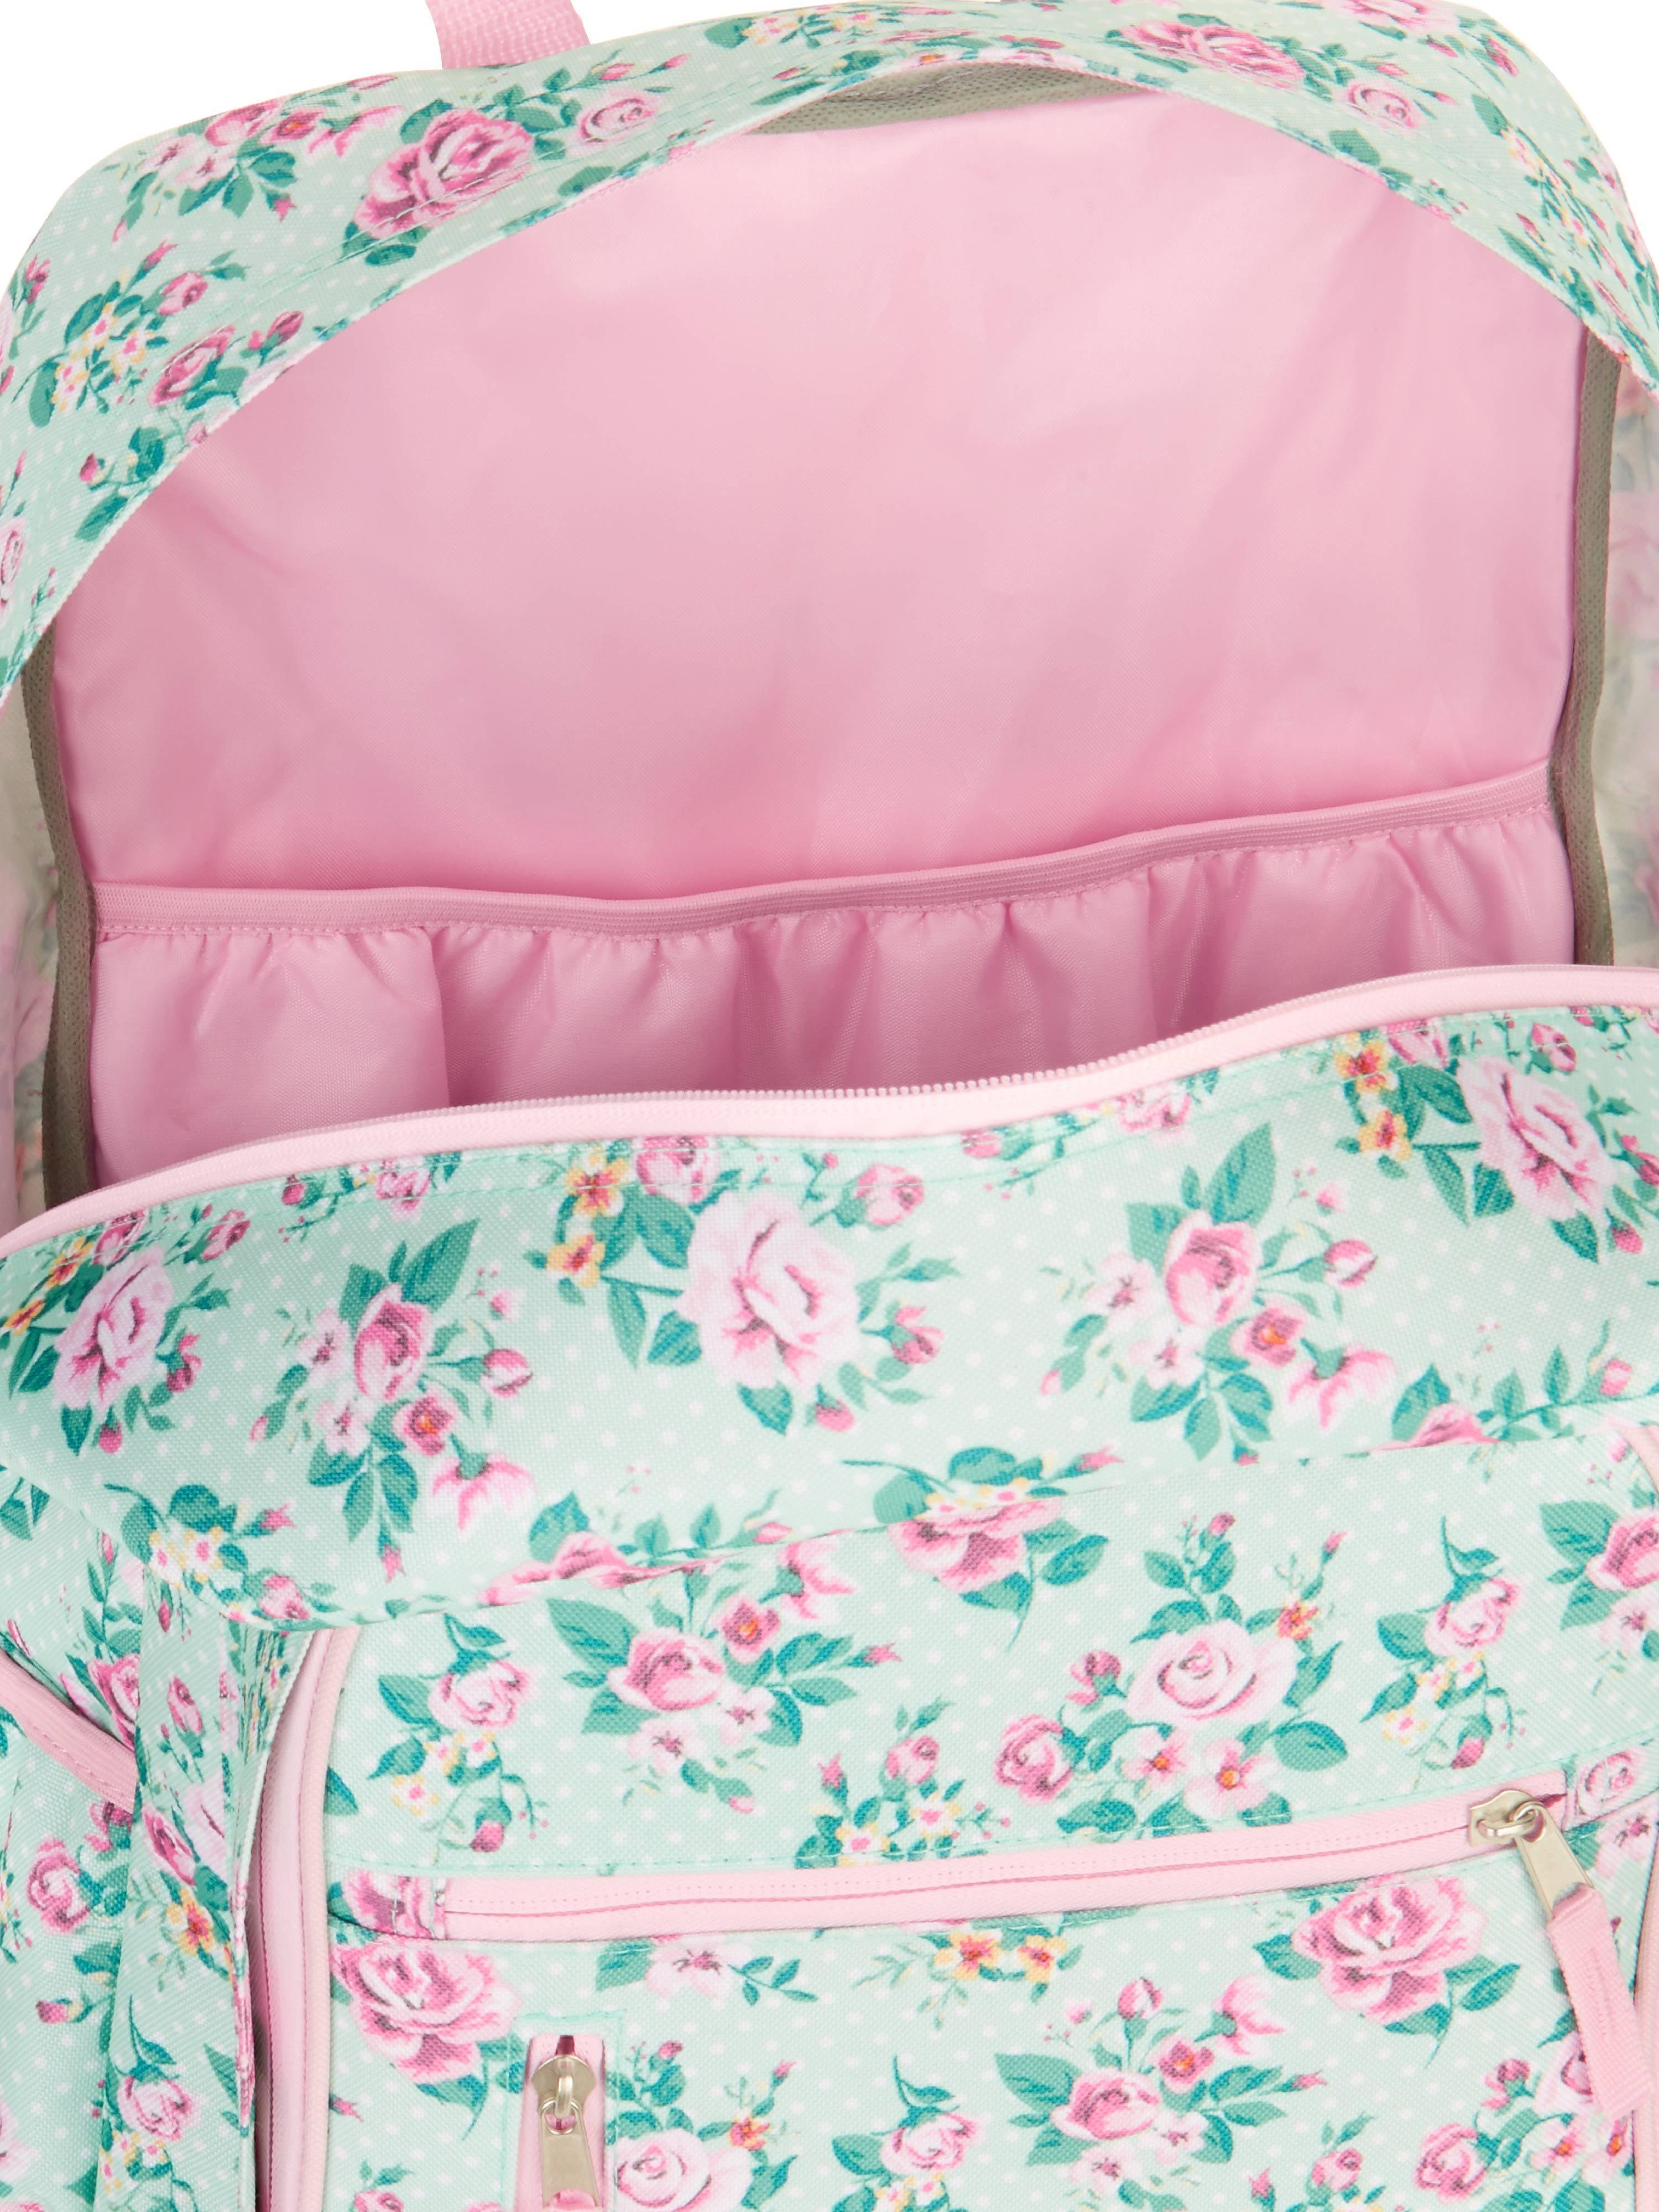 ed1873dacb90 No Boundaries Girls School Backpack